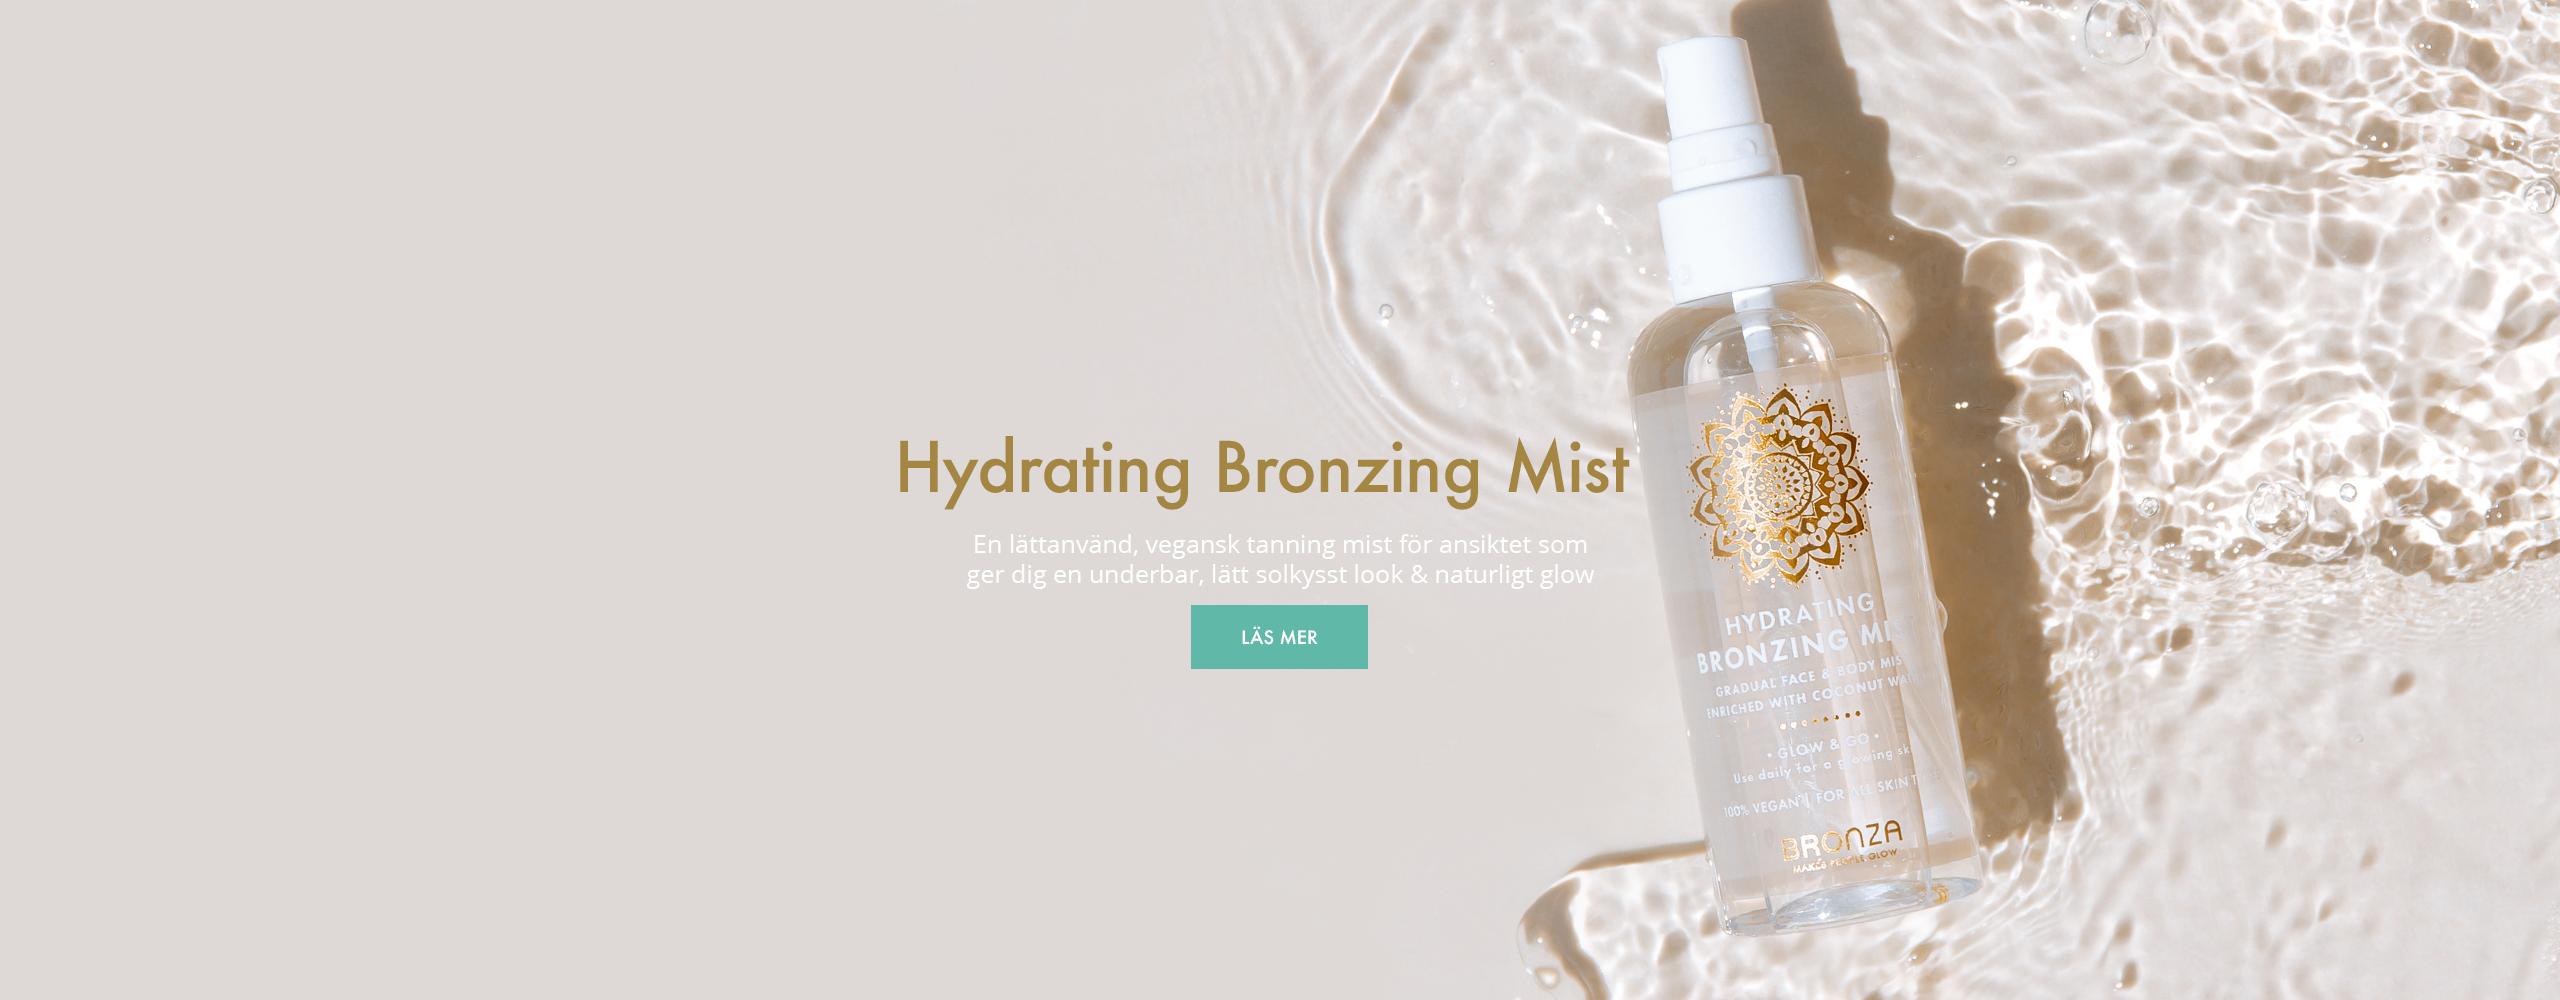 https://www.bronza.se/image/893/header_sv_hydrating_bronzing_mist_gold-kopia-.jpg